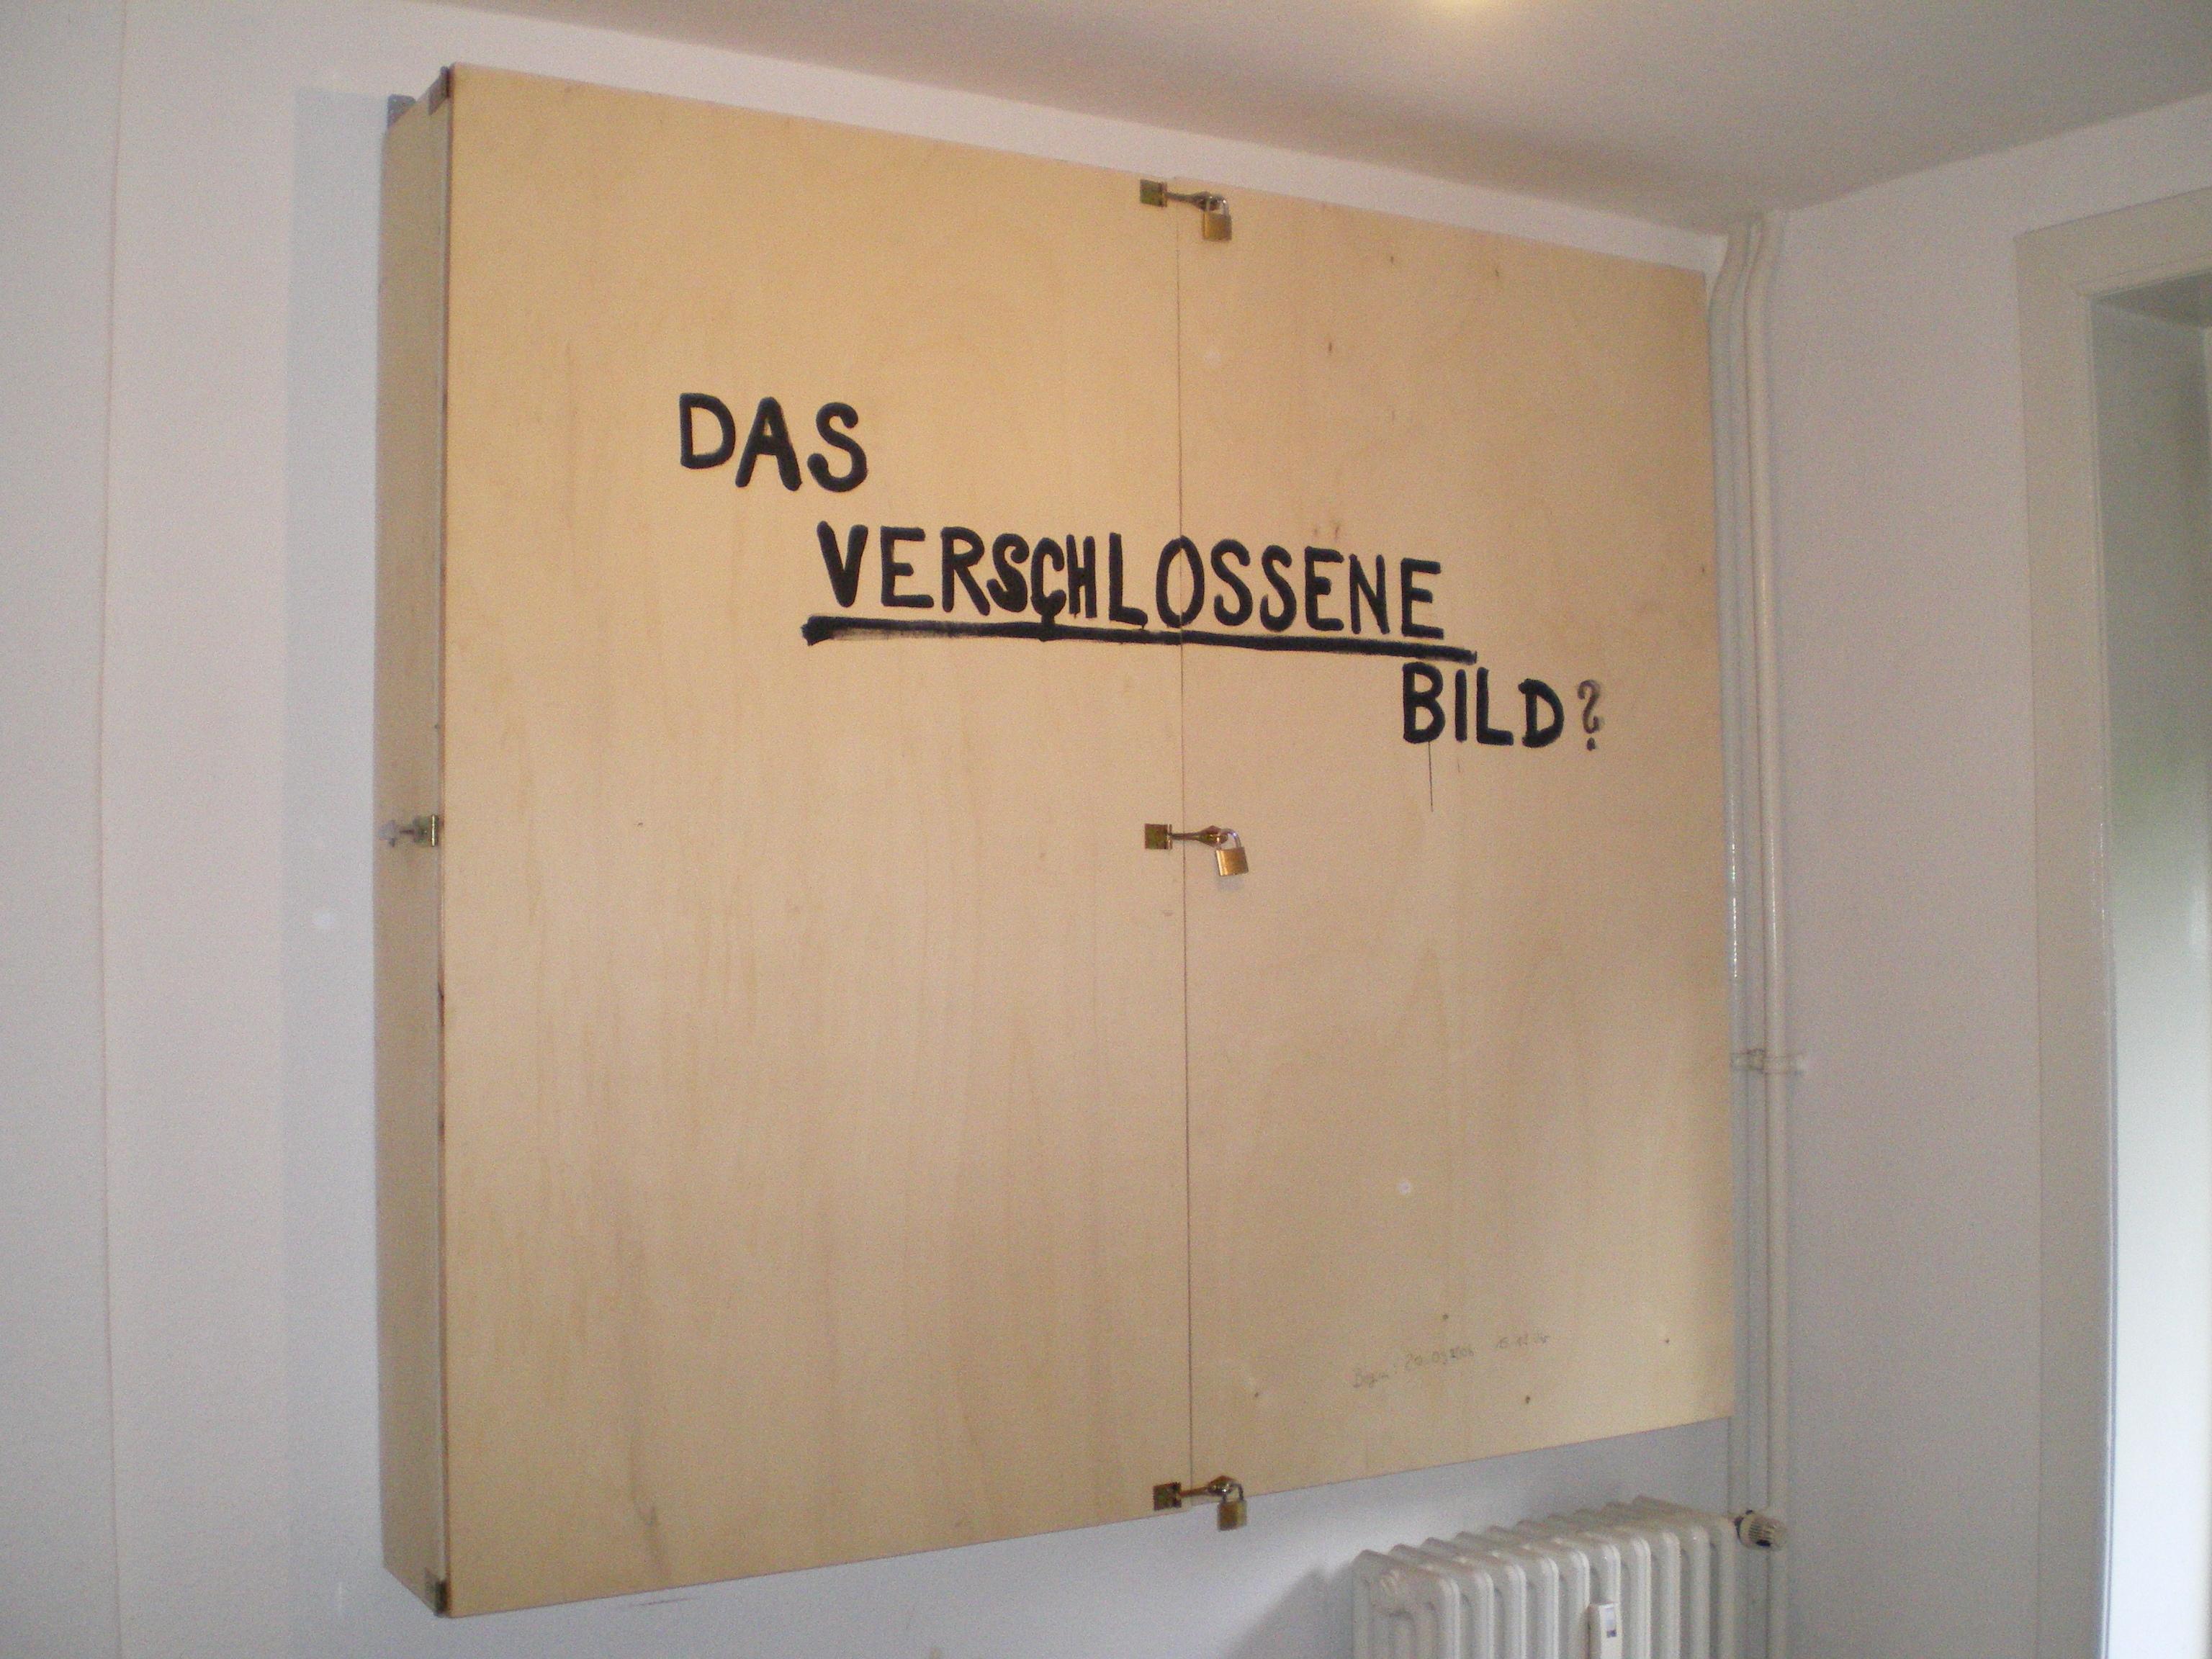 """Das verschlossene Bild"", 2006, zerstört"